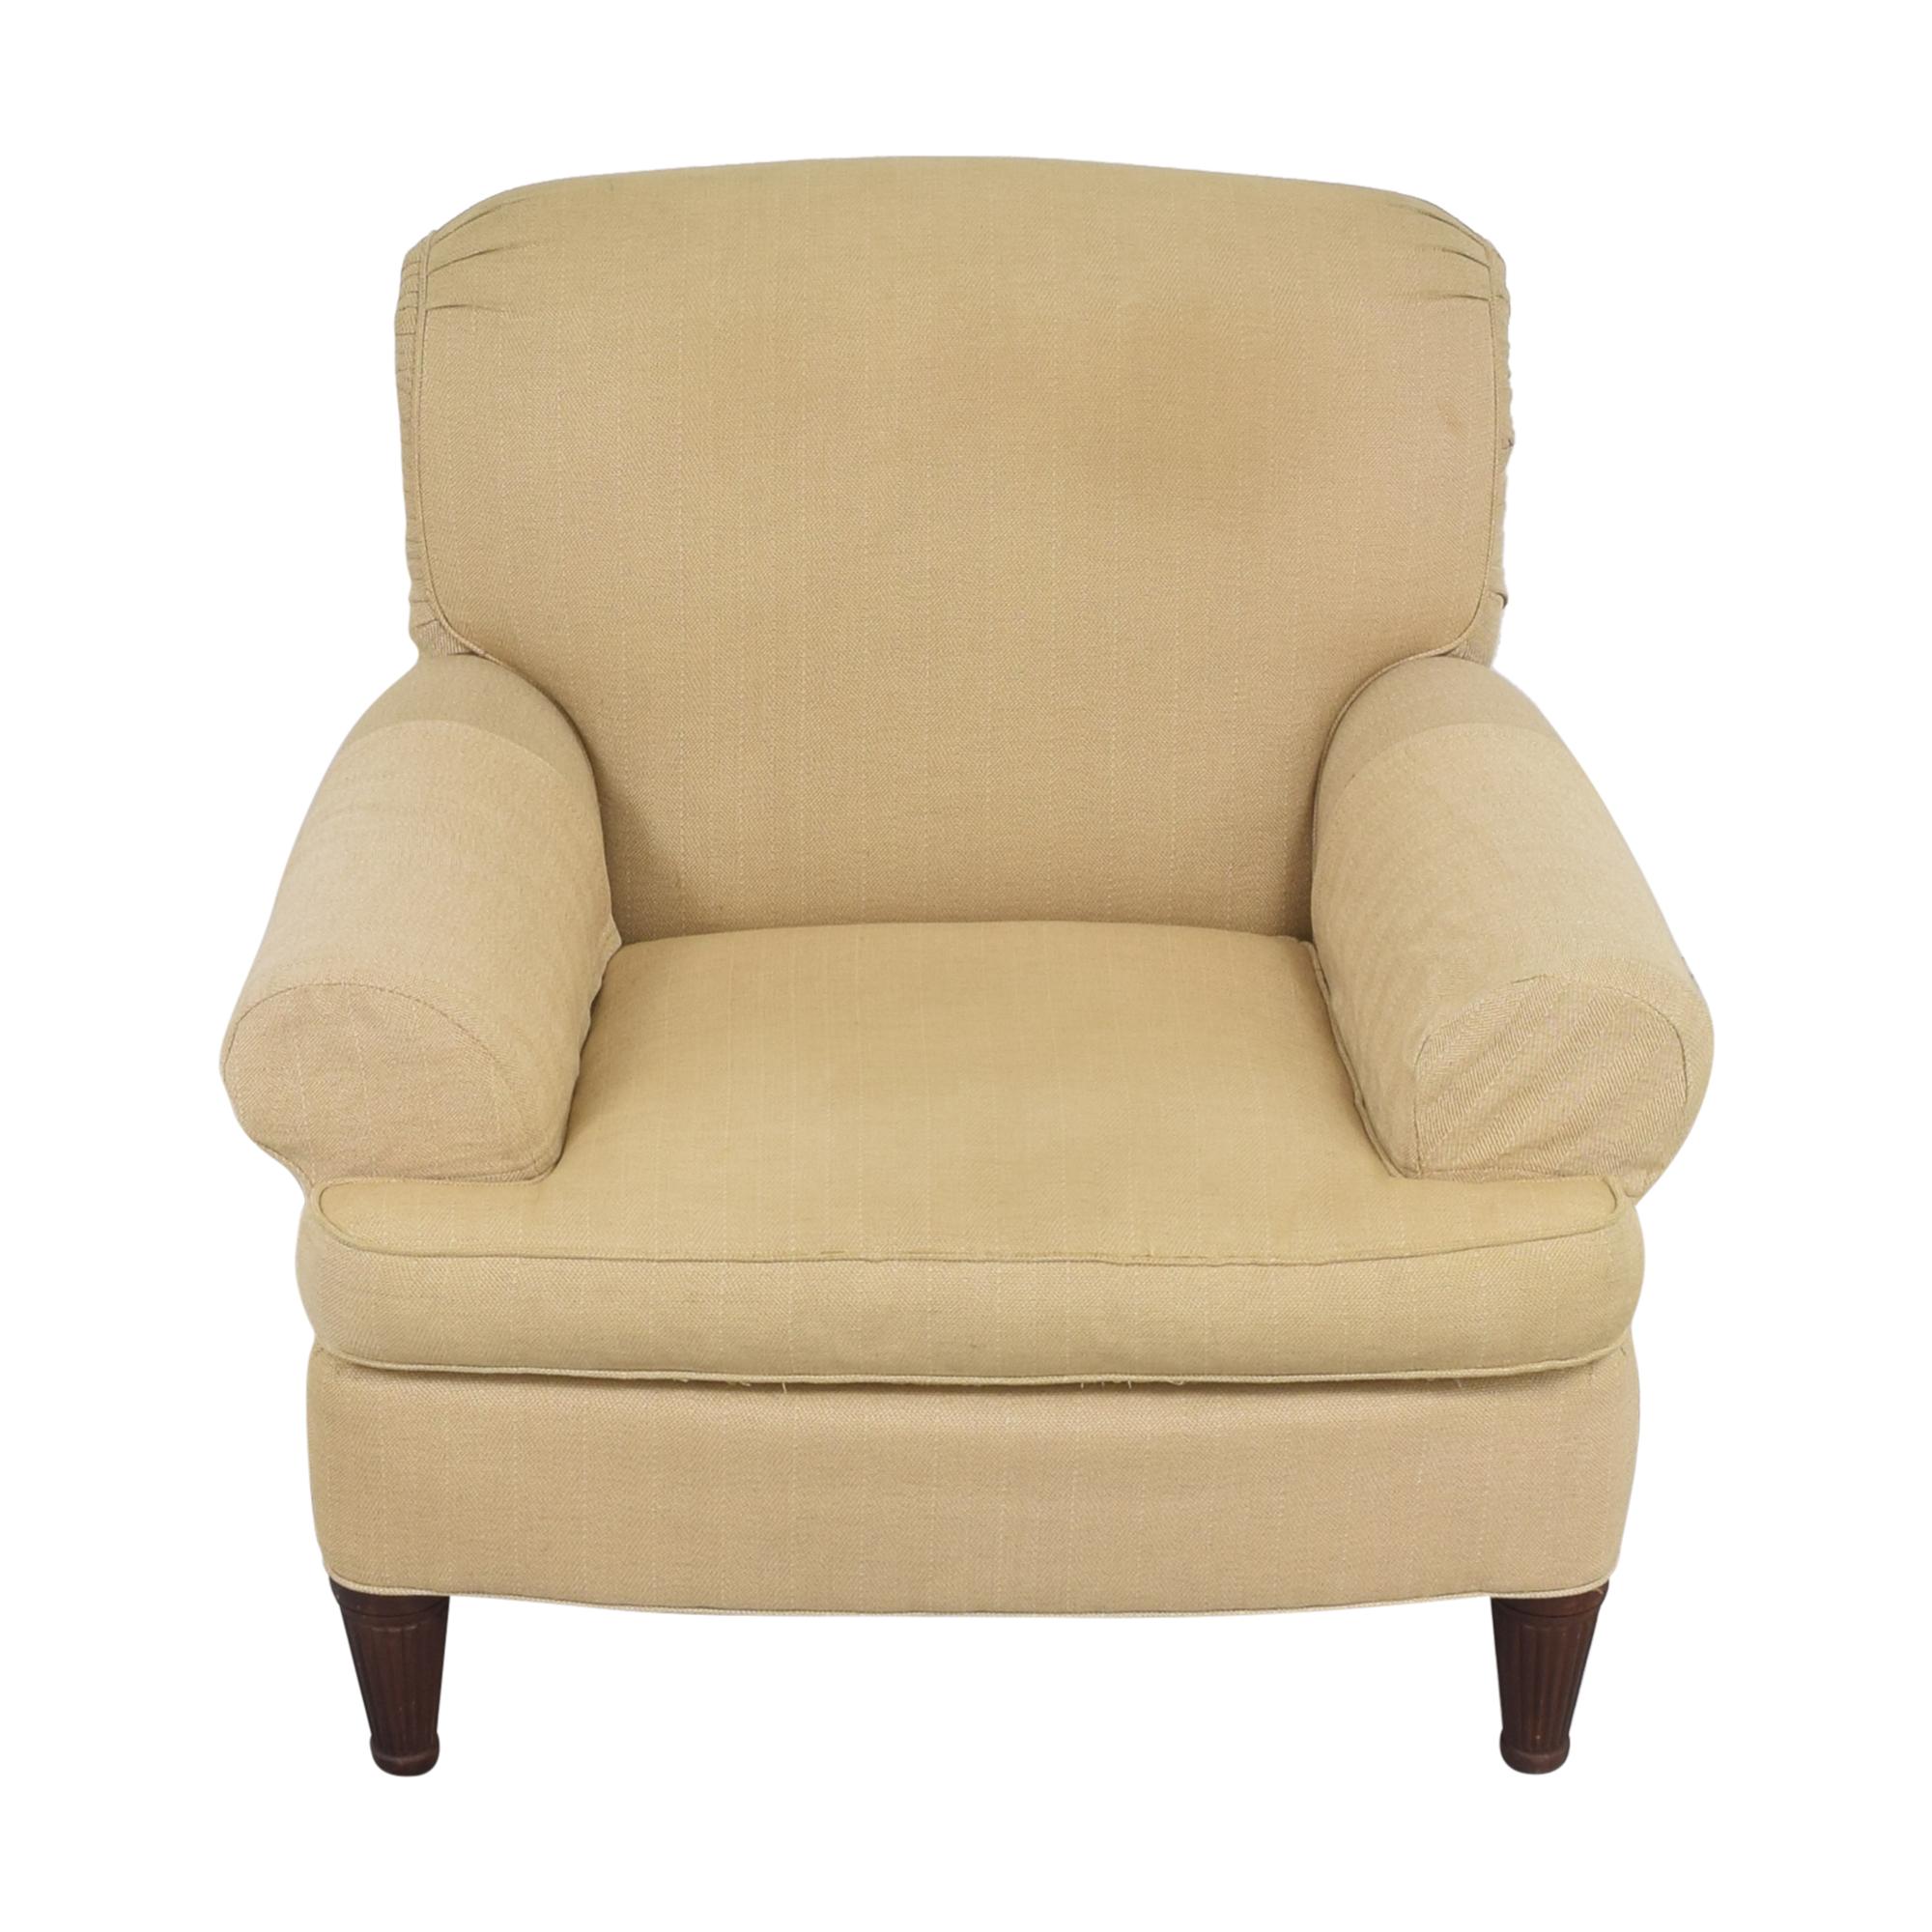 Ralph Lauren Home Accent Chair / Chairs